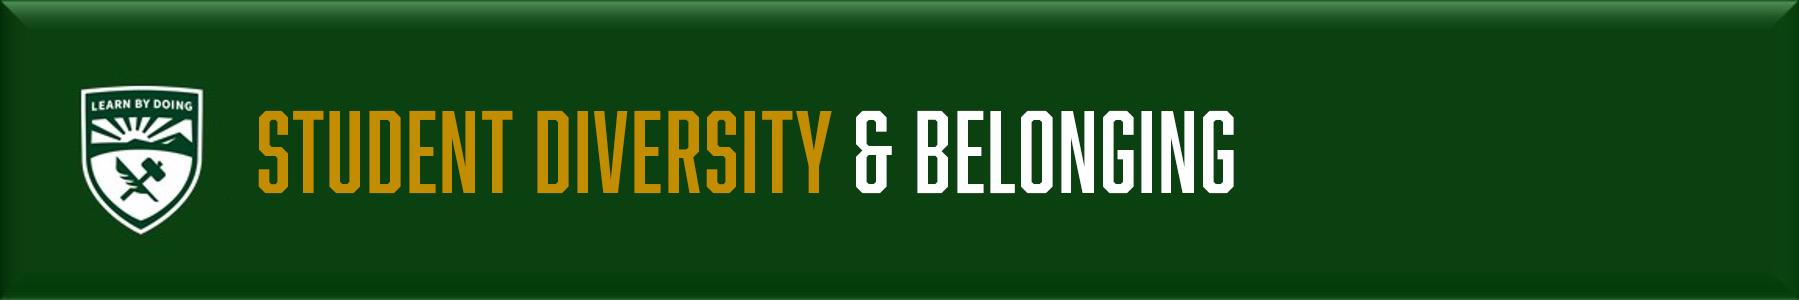 Student Diversity & Belonging